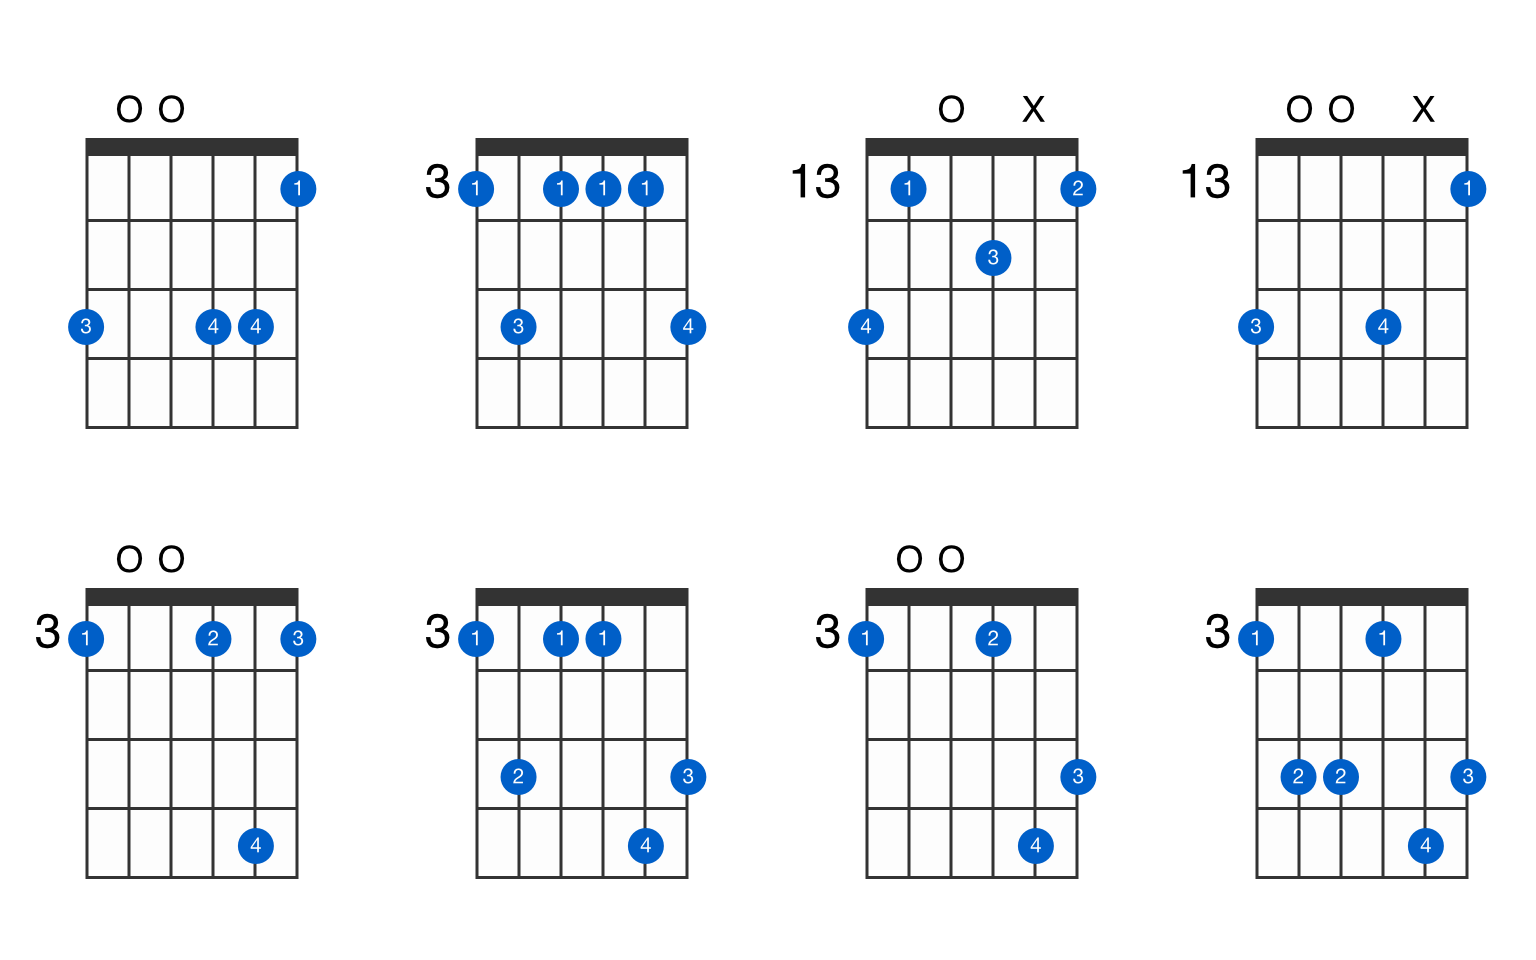 G minor 15 guitar chord   GtrLib Chords